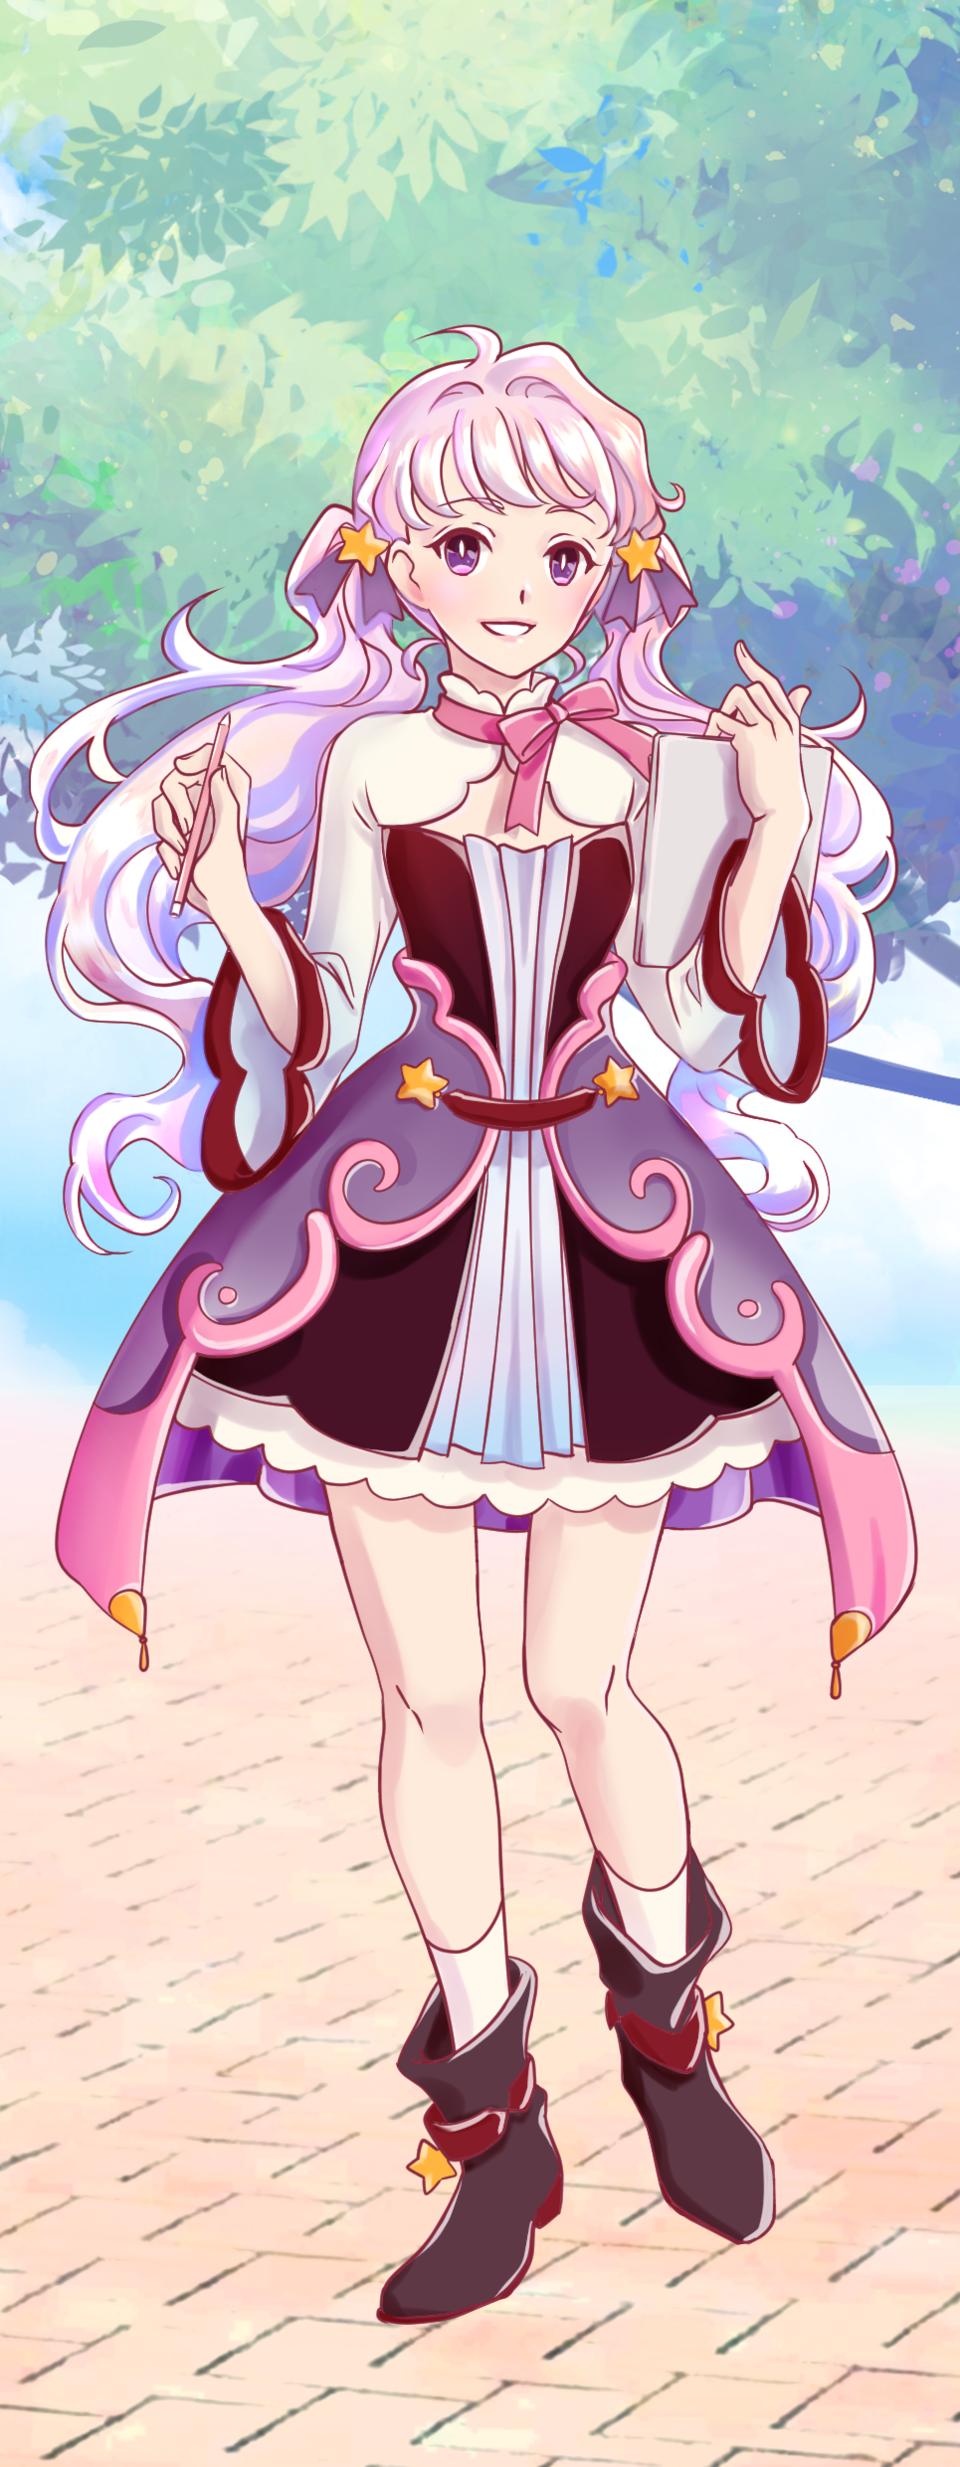 Pink girl Illust of ka.tjan PASTEL_SKETCH2020 oc girl mangagirl medibang pink characterdesign kawaii